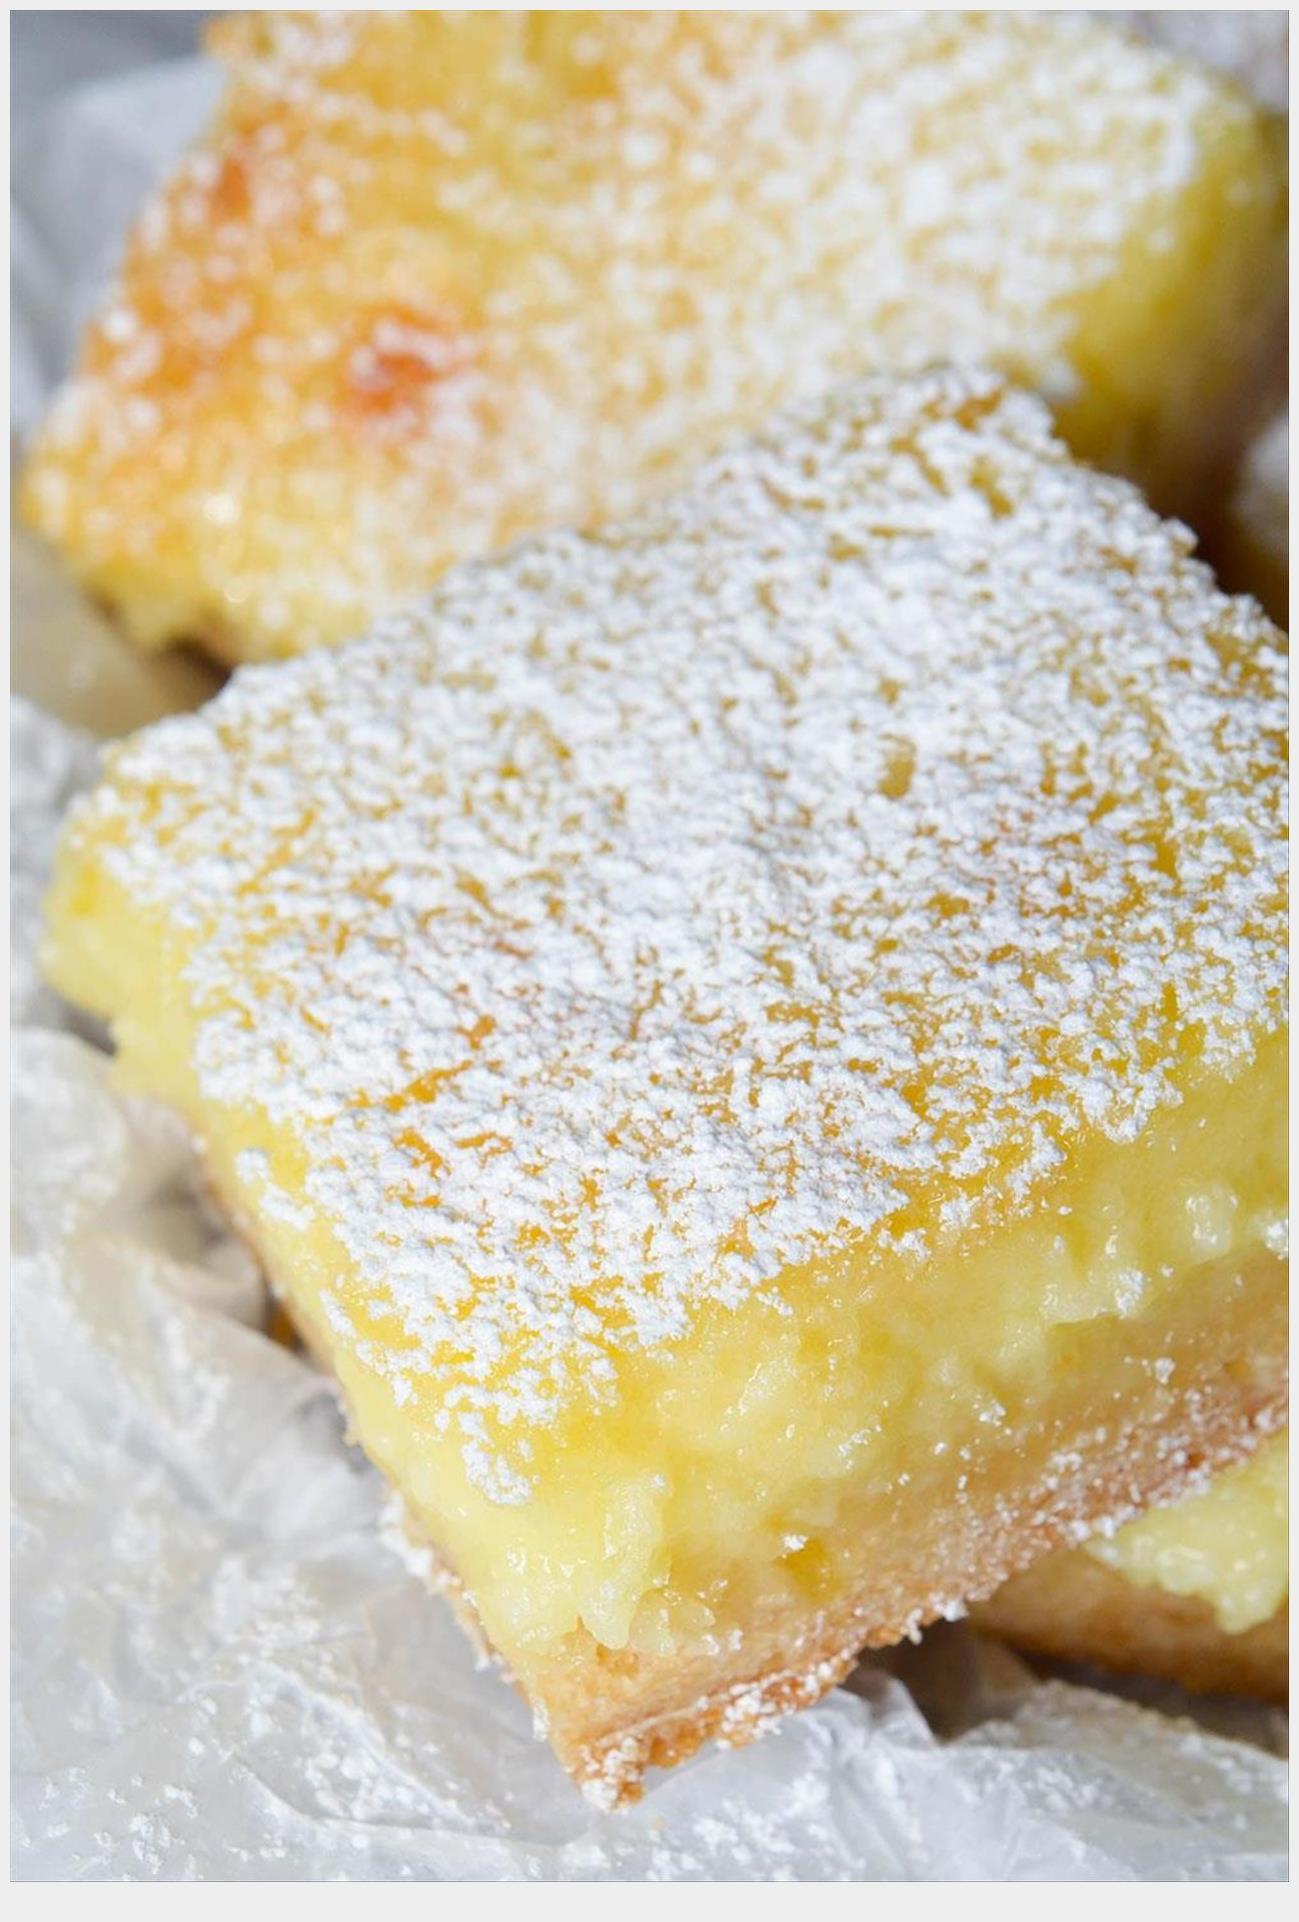 Wedding Cake Recipe Using Cake Mix  Top recipes using yellow cake mix recipe 18 ⋆ Cakes for